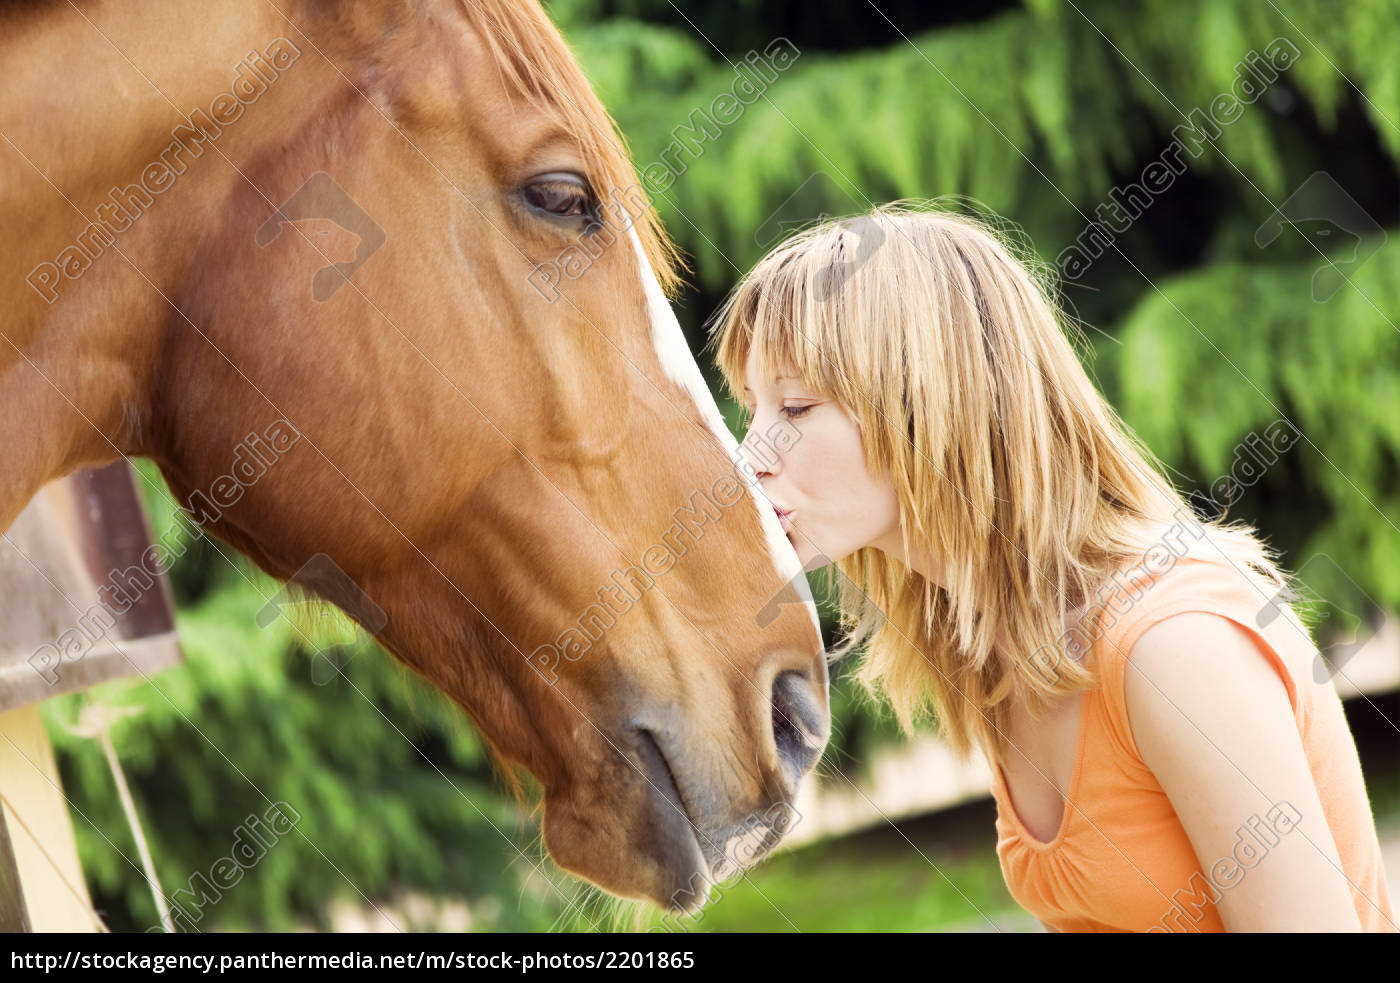 horse - 2201865